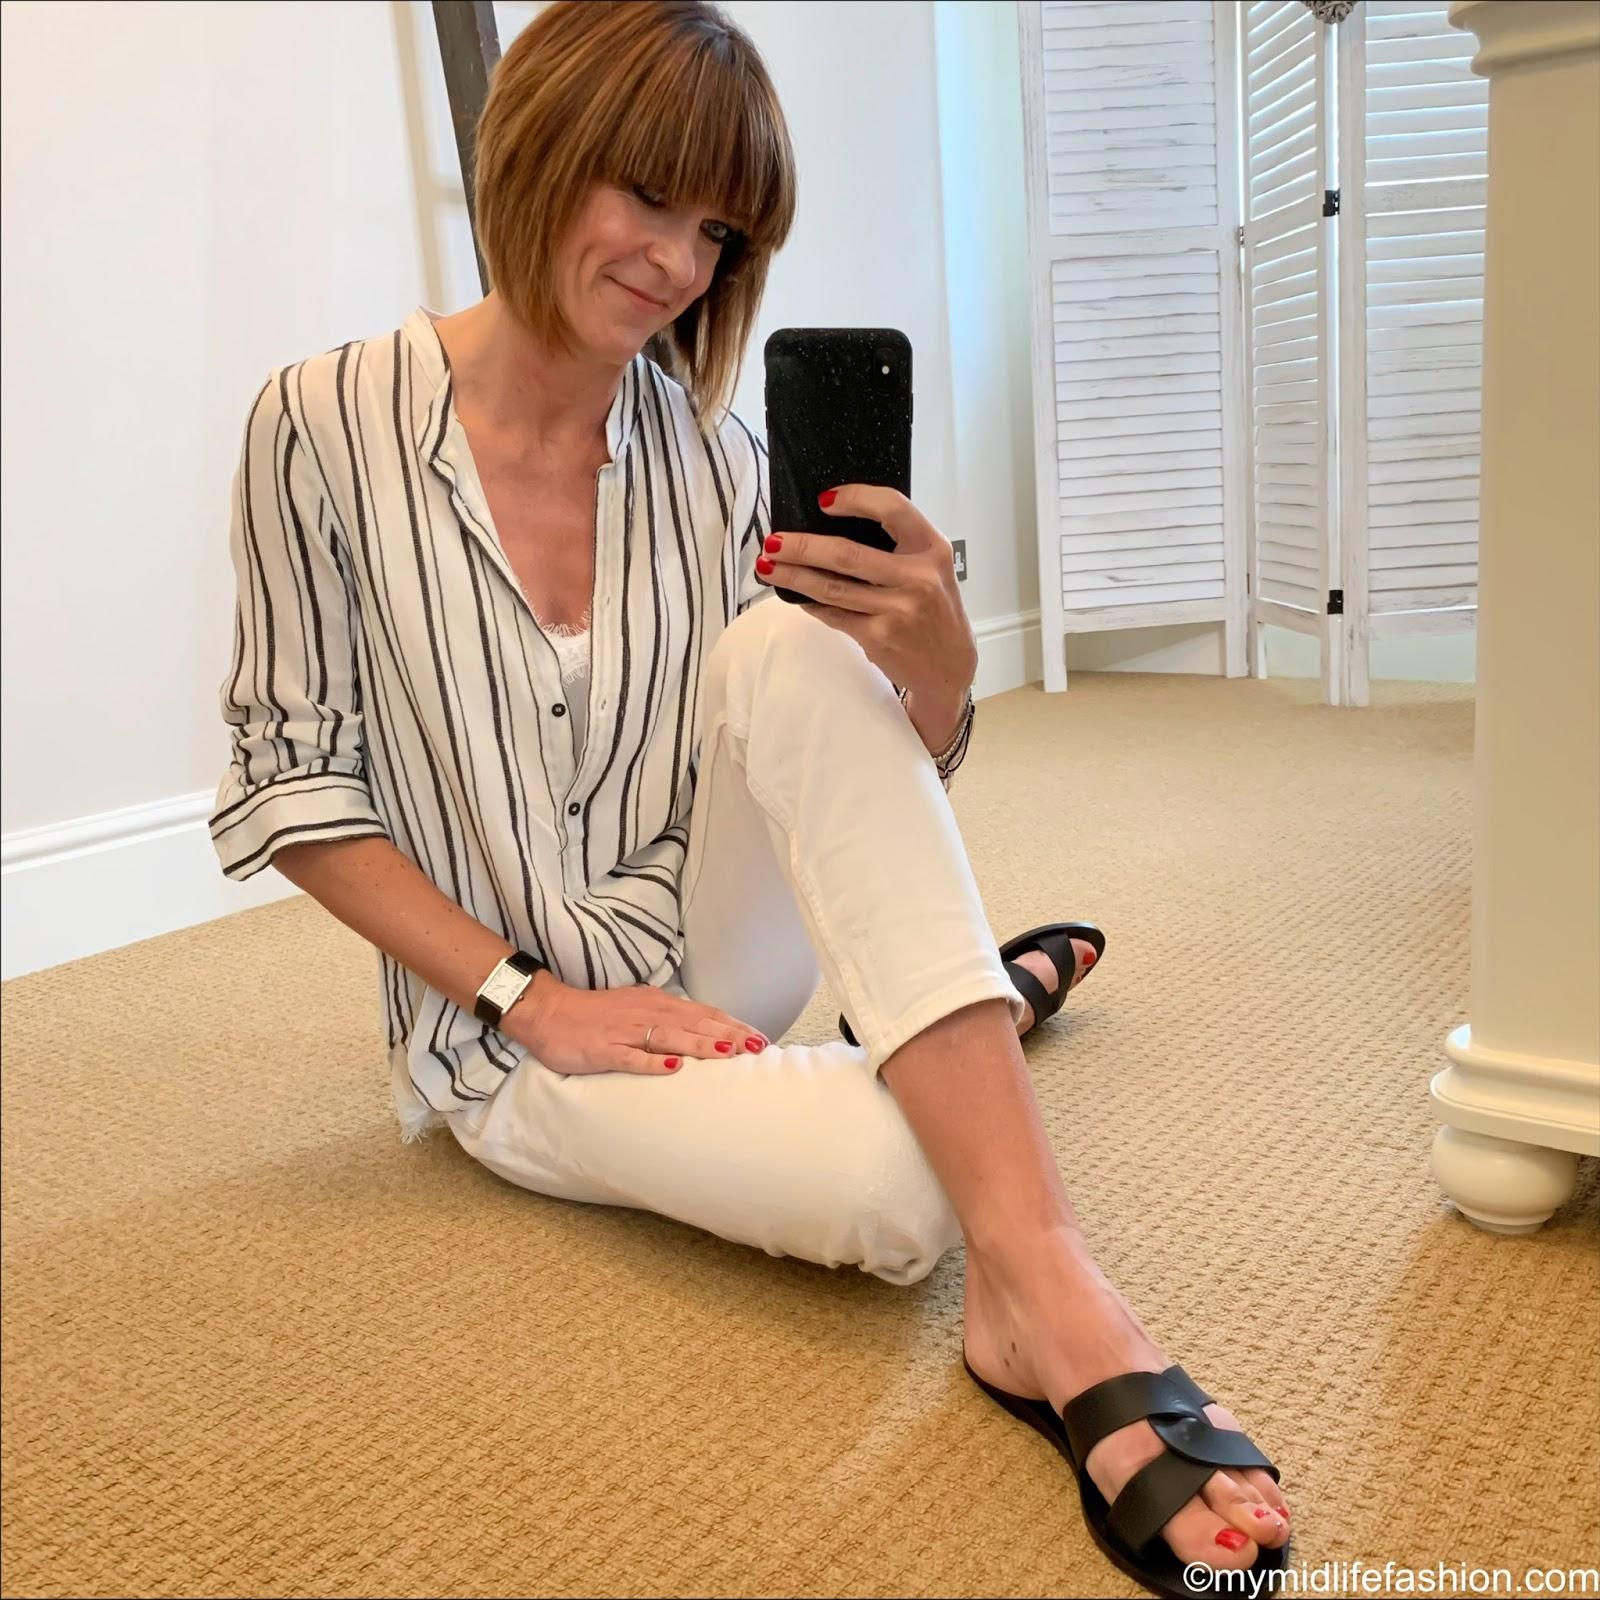 my midlife fashion, Ancient Greek desmos leather slides, Isabel Marant Etoile stripe linen shirt, Zara lace trim camisole, Zara cigarette jeans